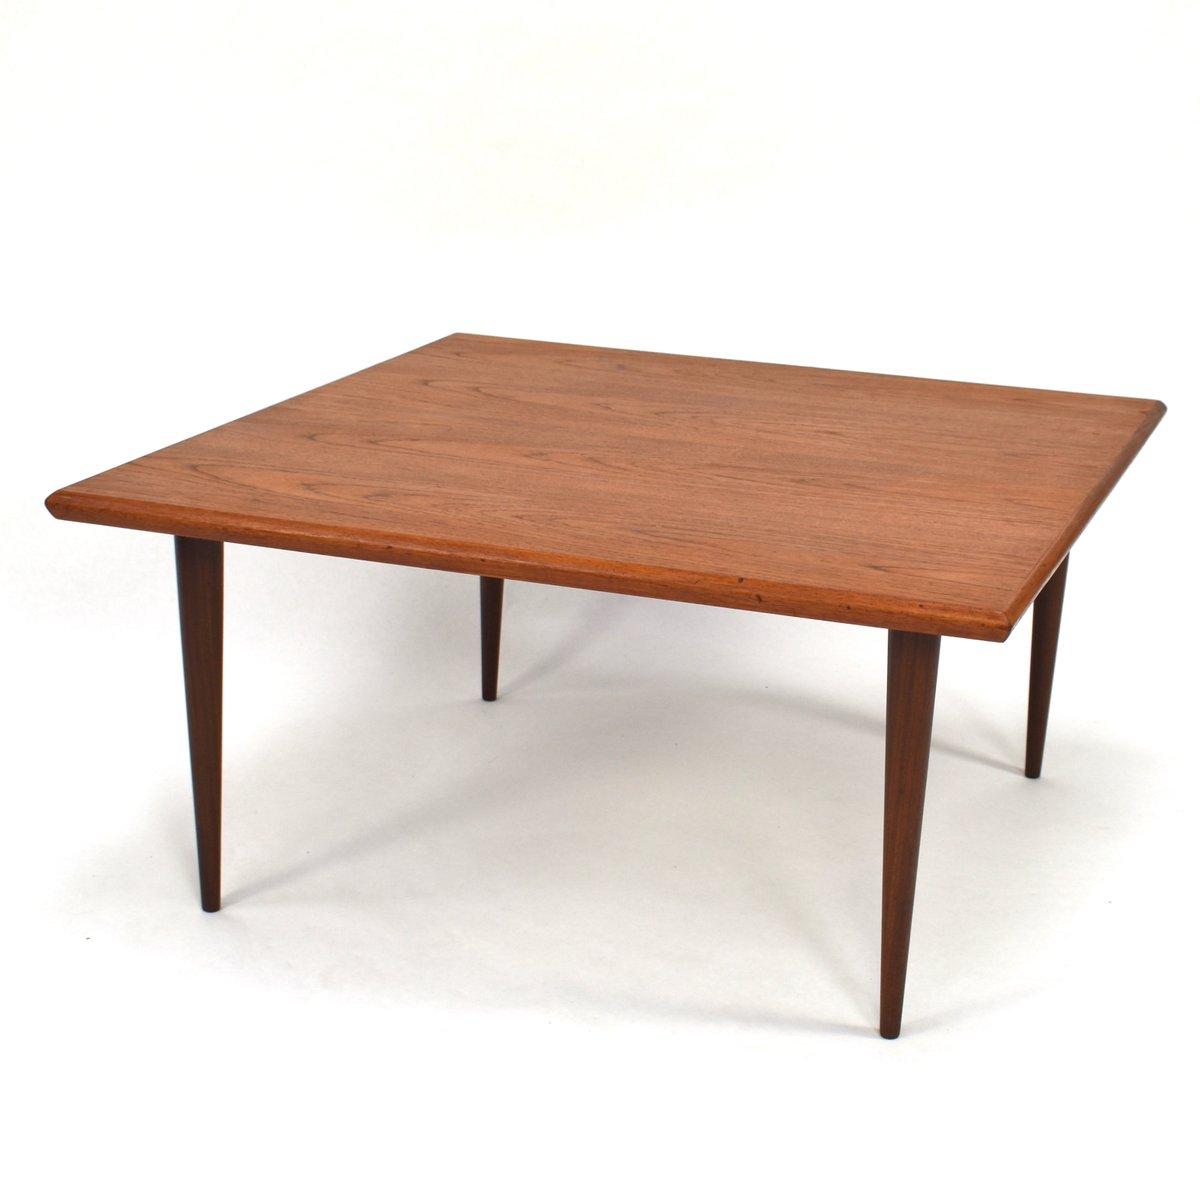 Coffee Table 1950s: Danish Teak Coffee Table, 1950s For Sale At Pamono